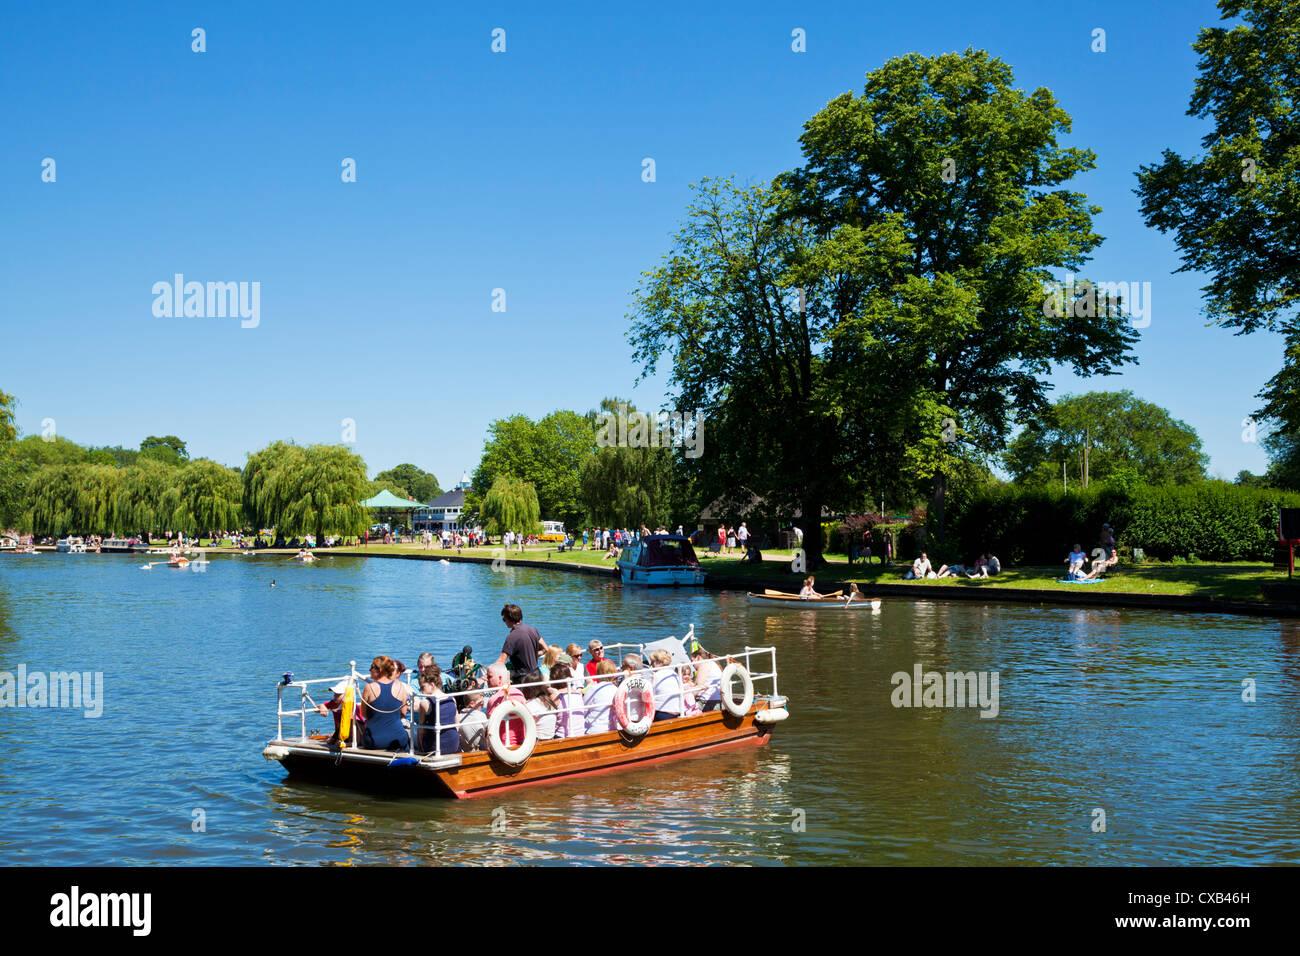 An unusual handcrank chain ferry across the River Avon Stratford upon avon Warwickshire England UK GB EU Europe - Stock Image